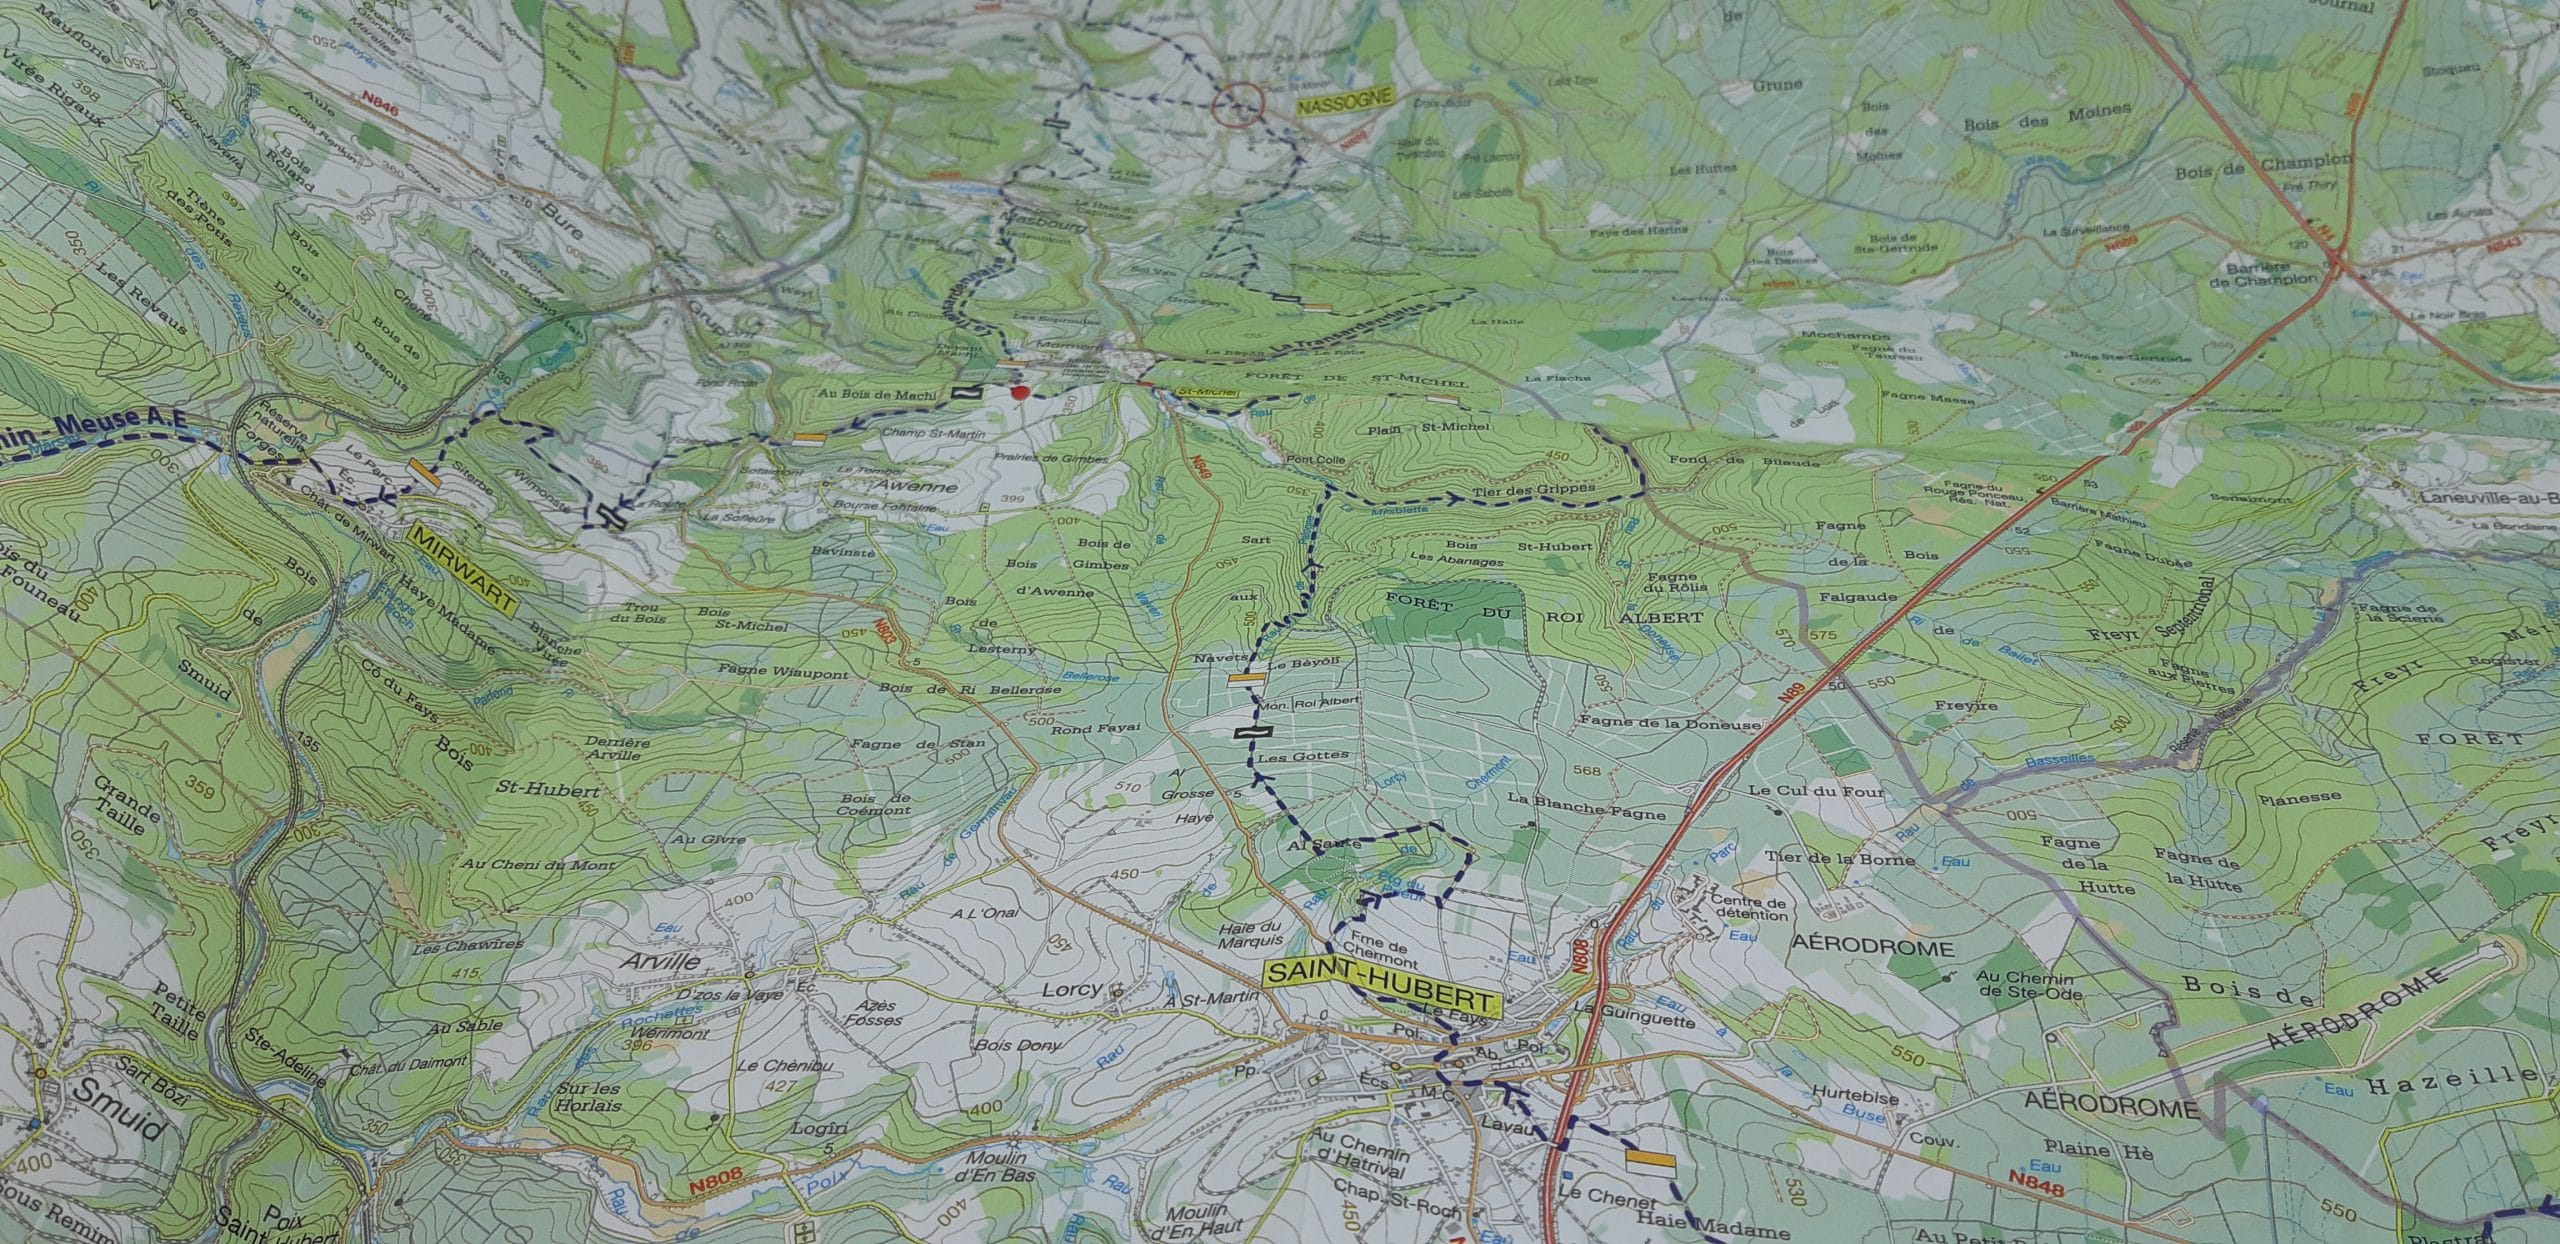 map of the Transardennaise